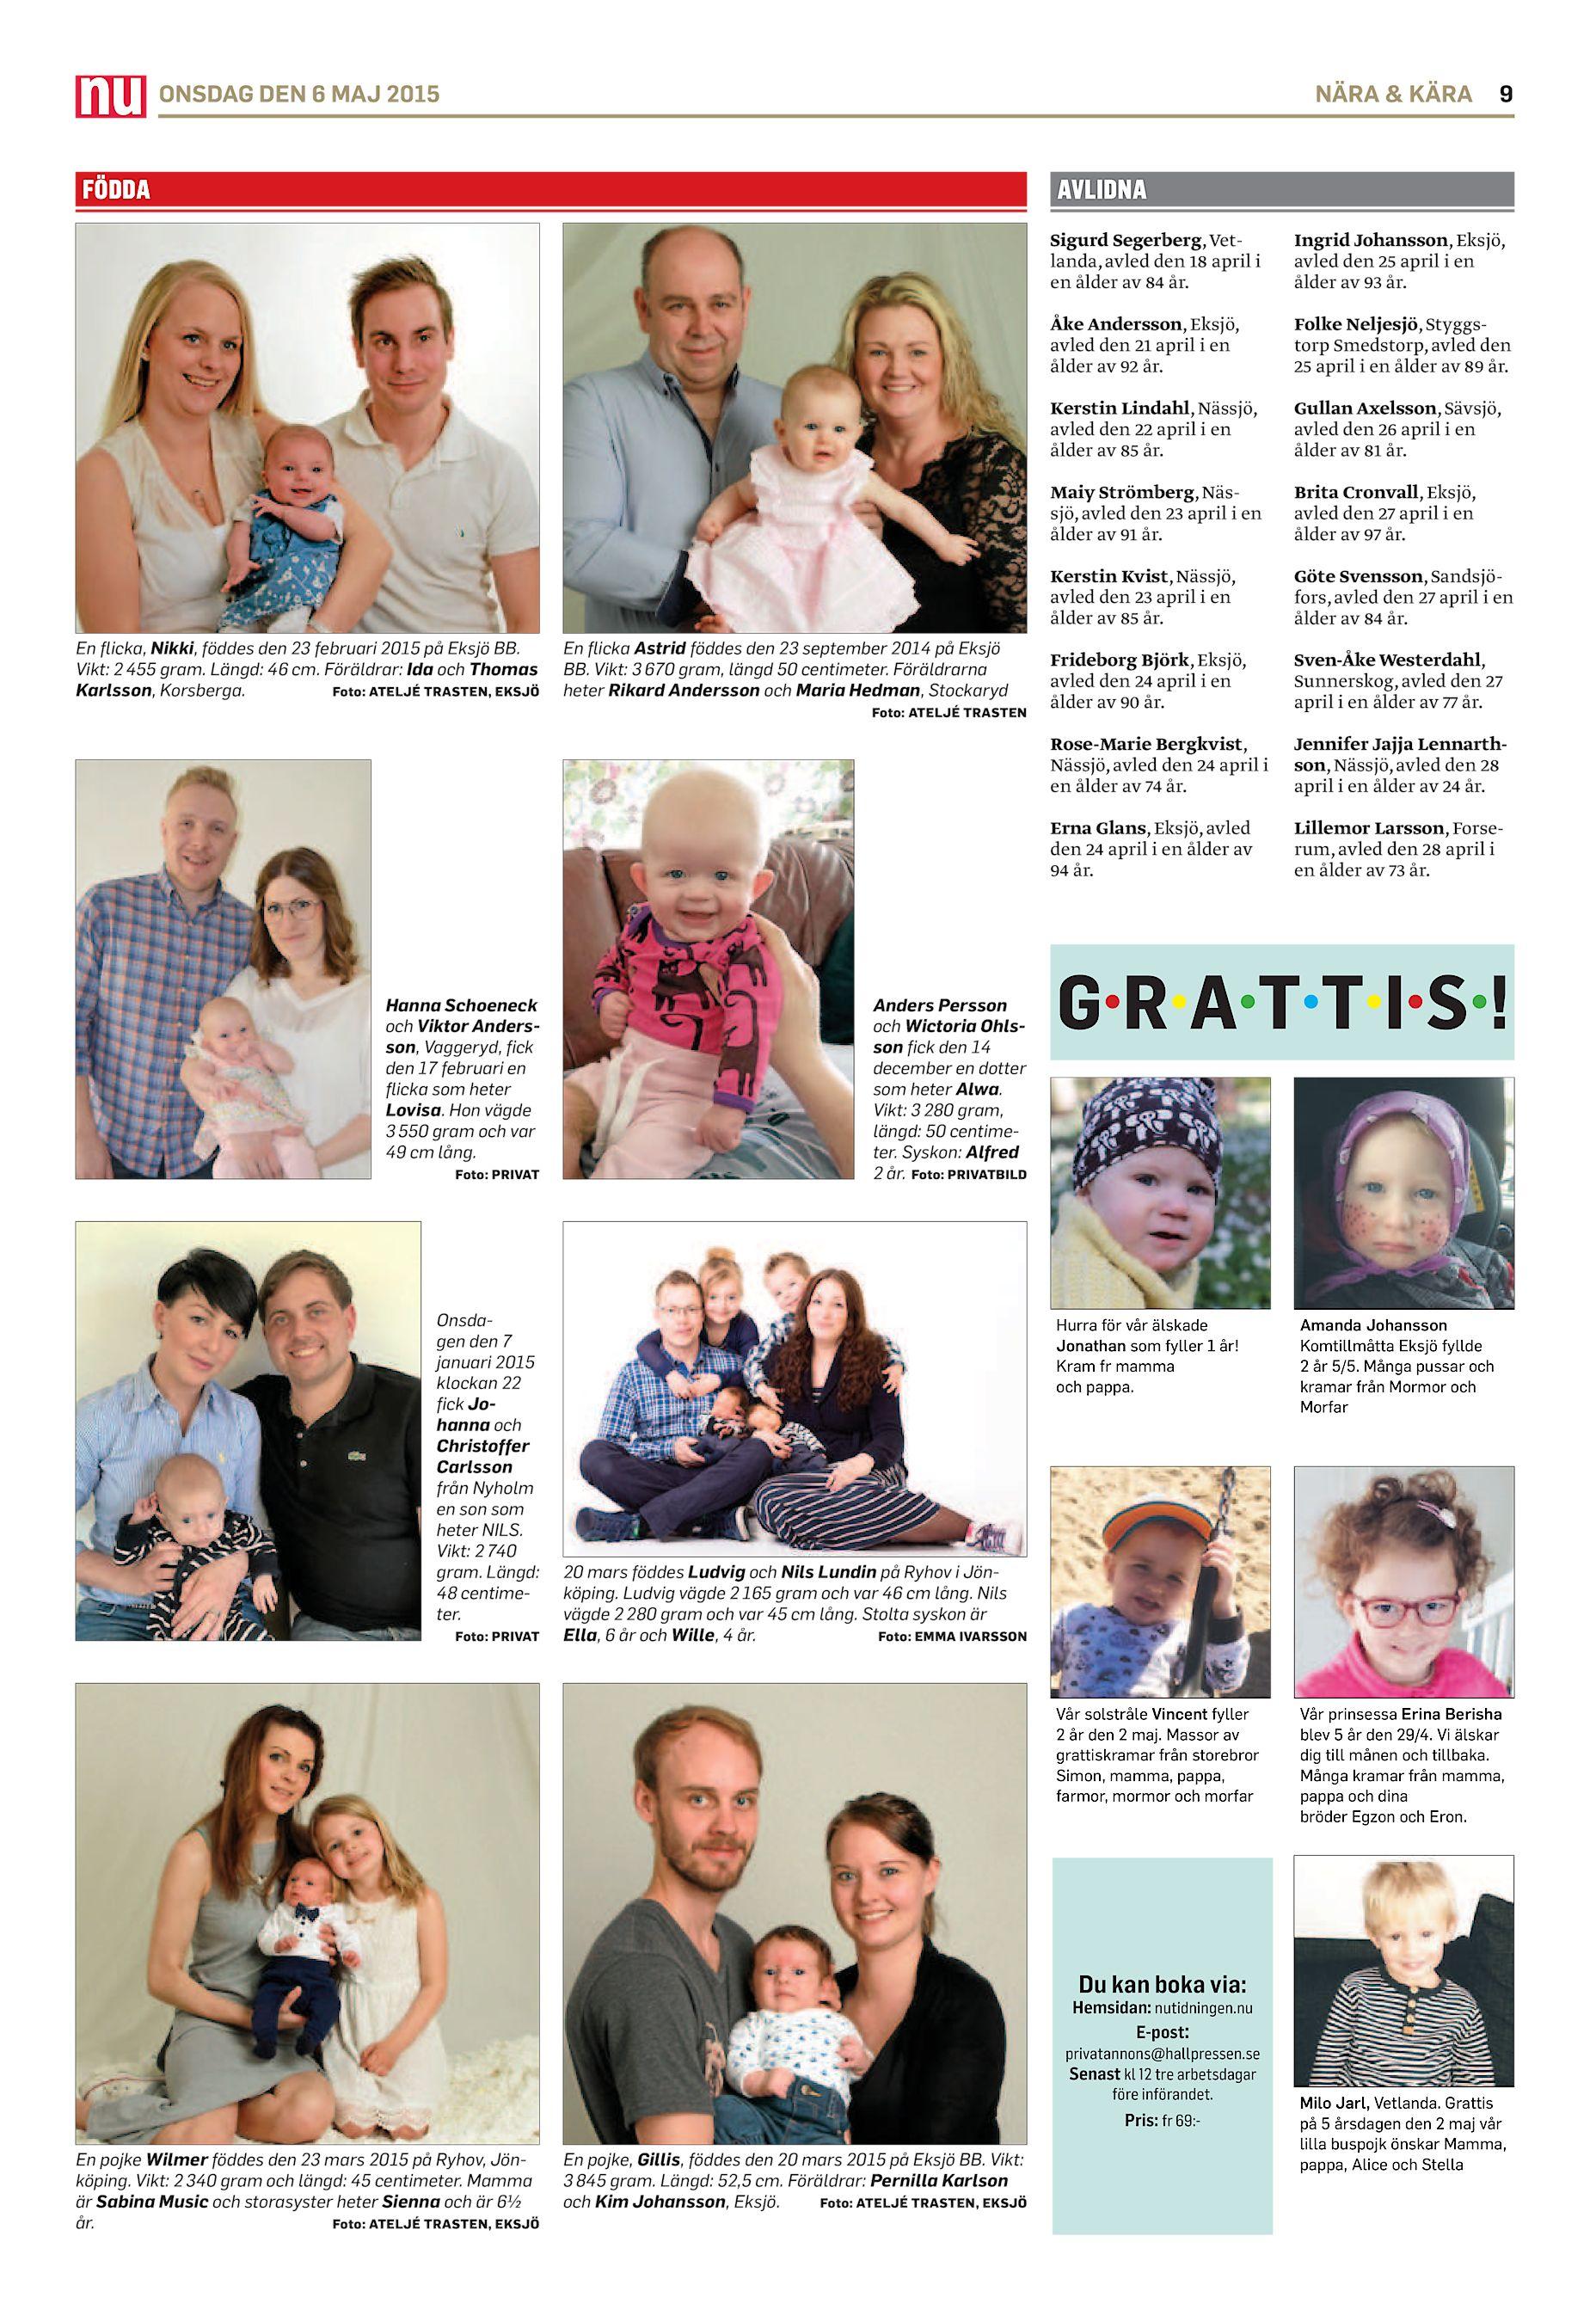 Prstgatan 26 Jnkpings ln, Stockaryd - satisfaction-survey.net